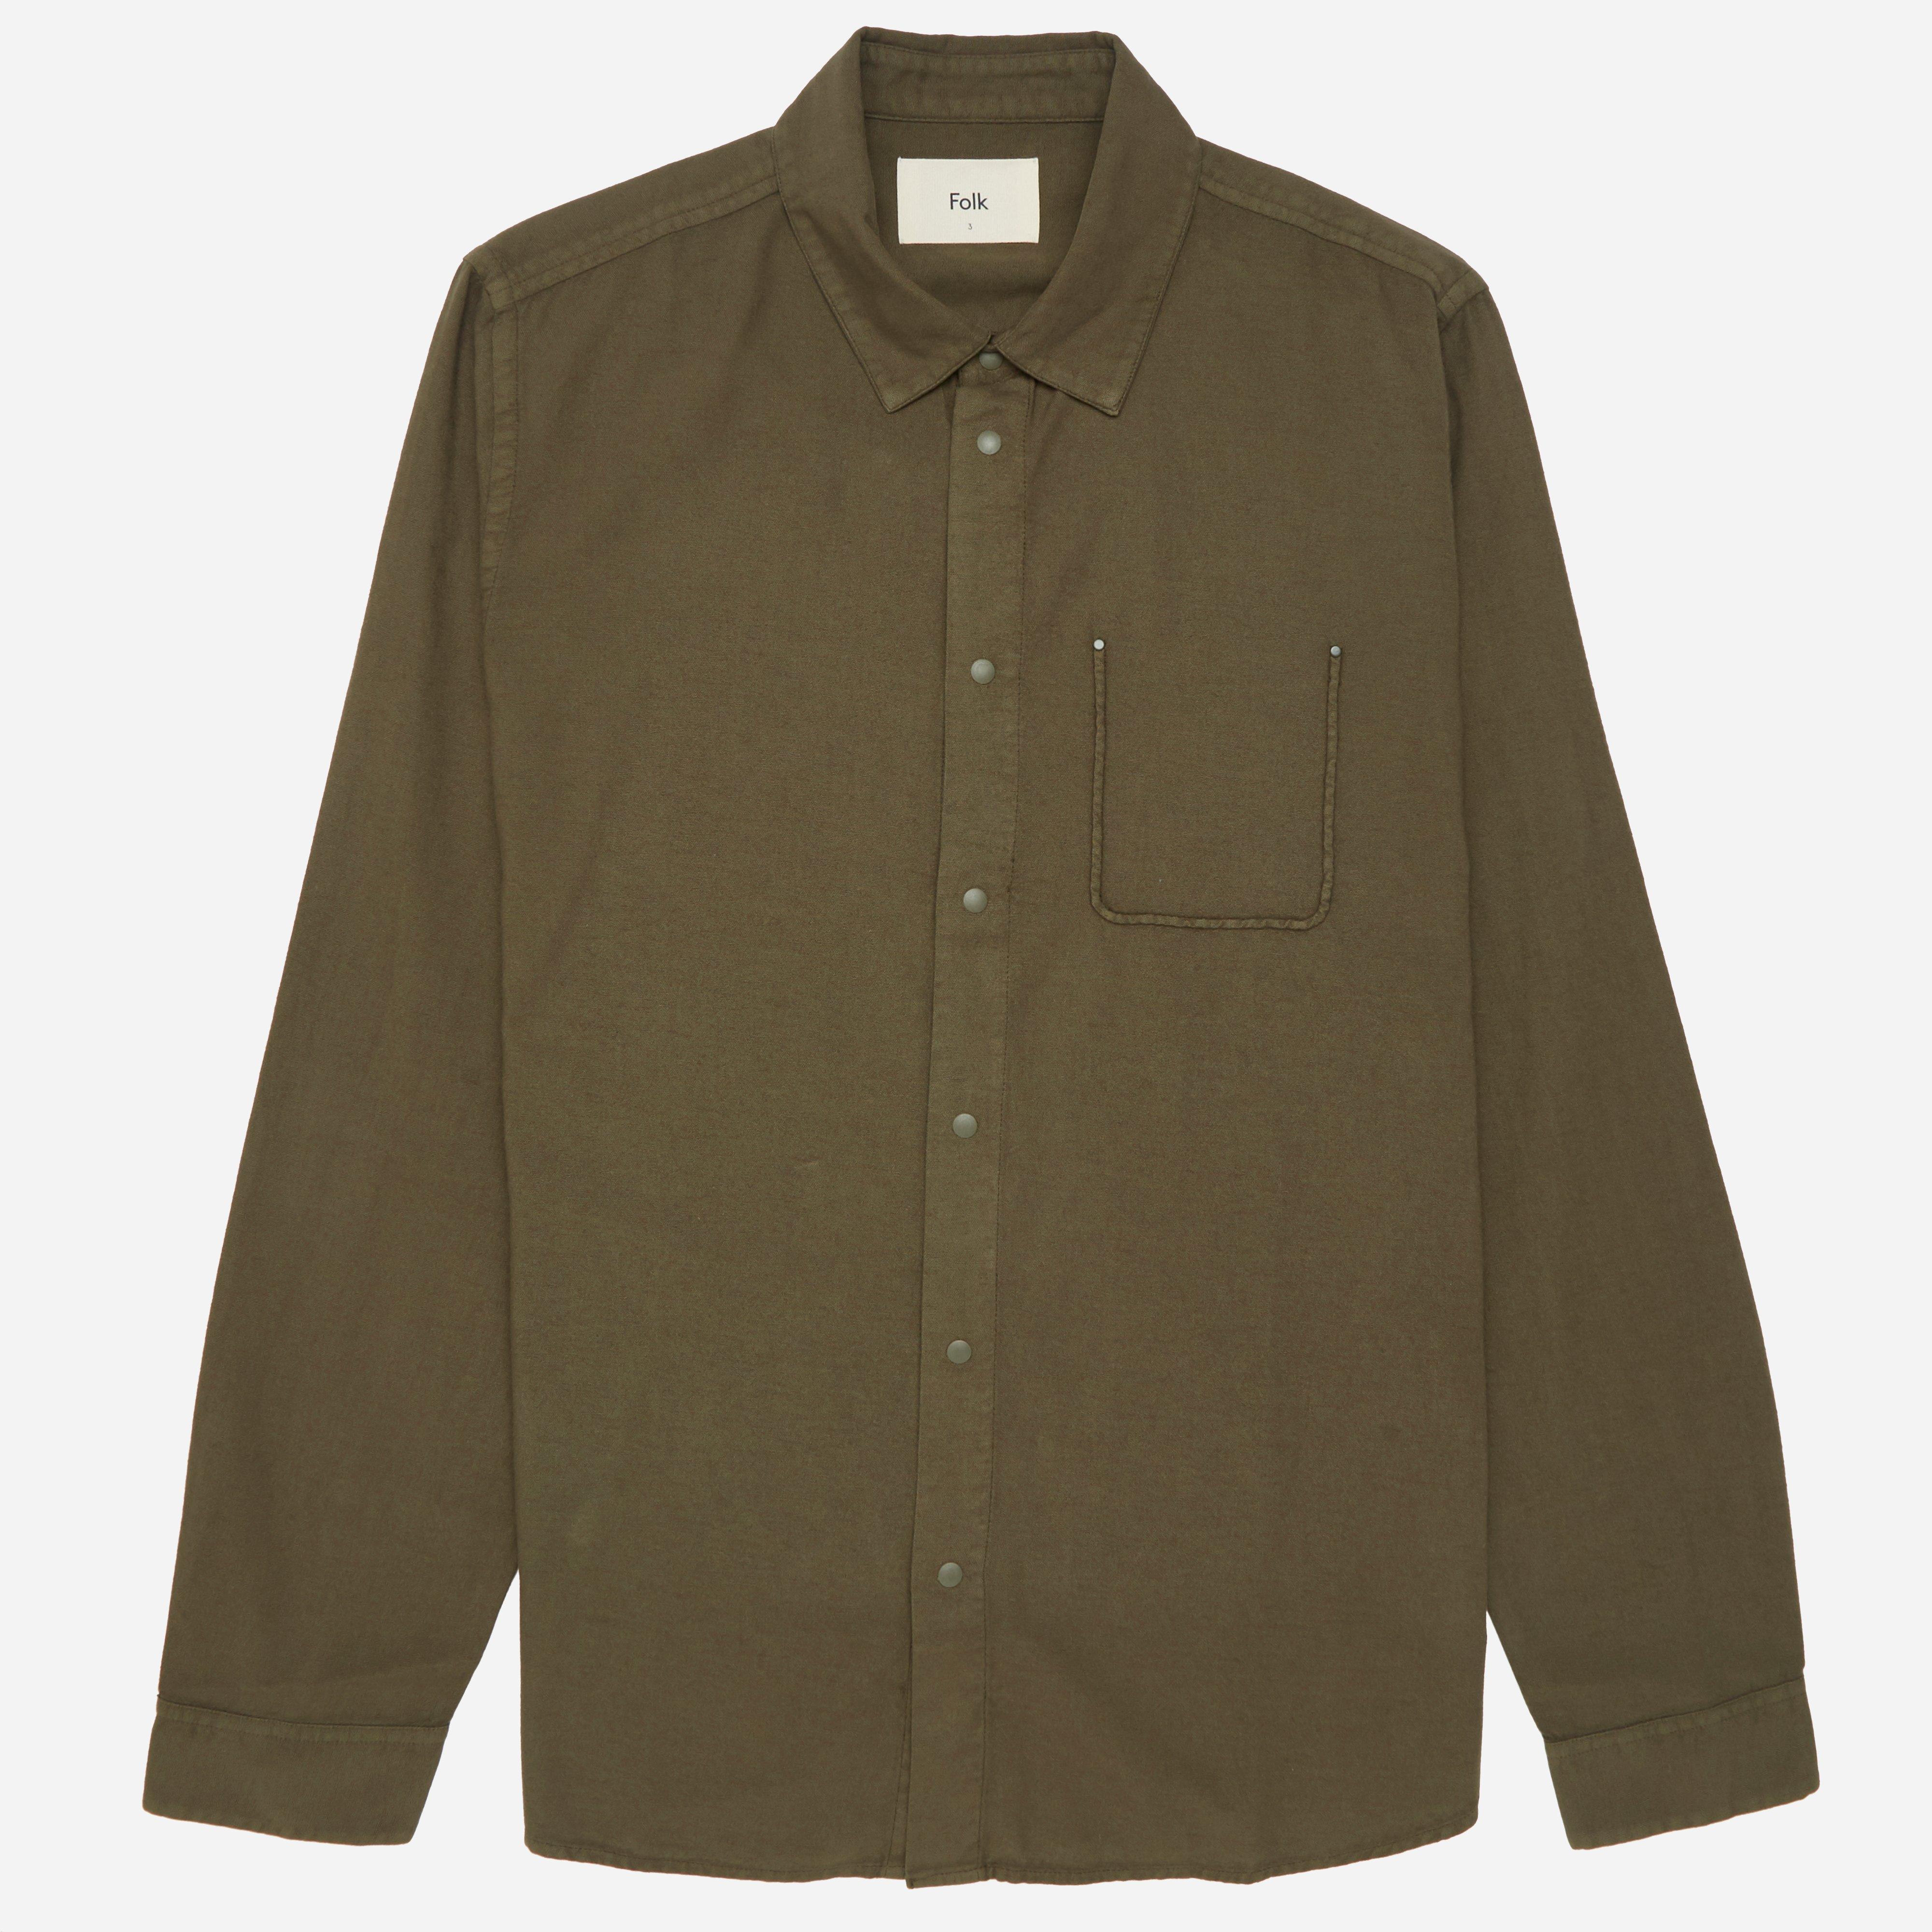 Folk Flannel Pop Stud Shirt